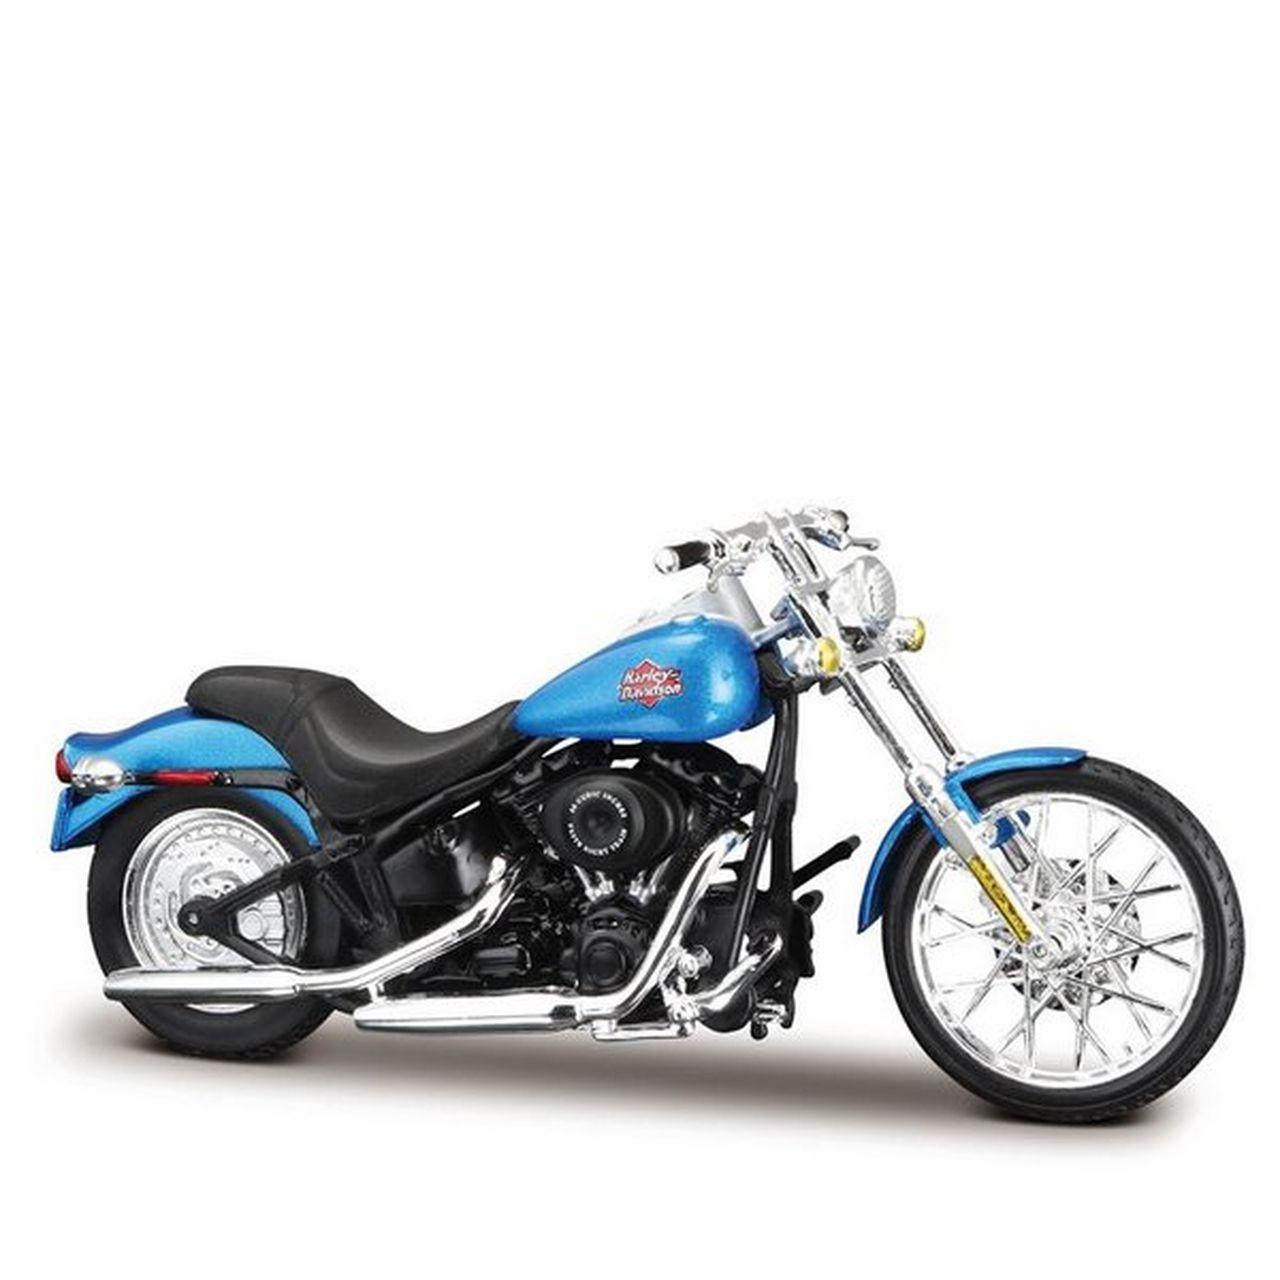 Miniatura Moto 2002 FXSBT Night Train: Harley Davidson (Serie 36) Escala 1/18 - Maisco